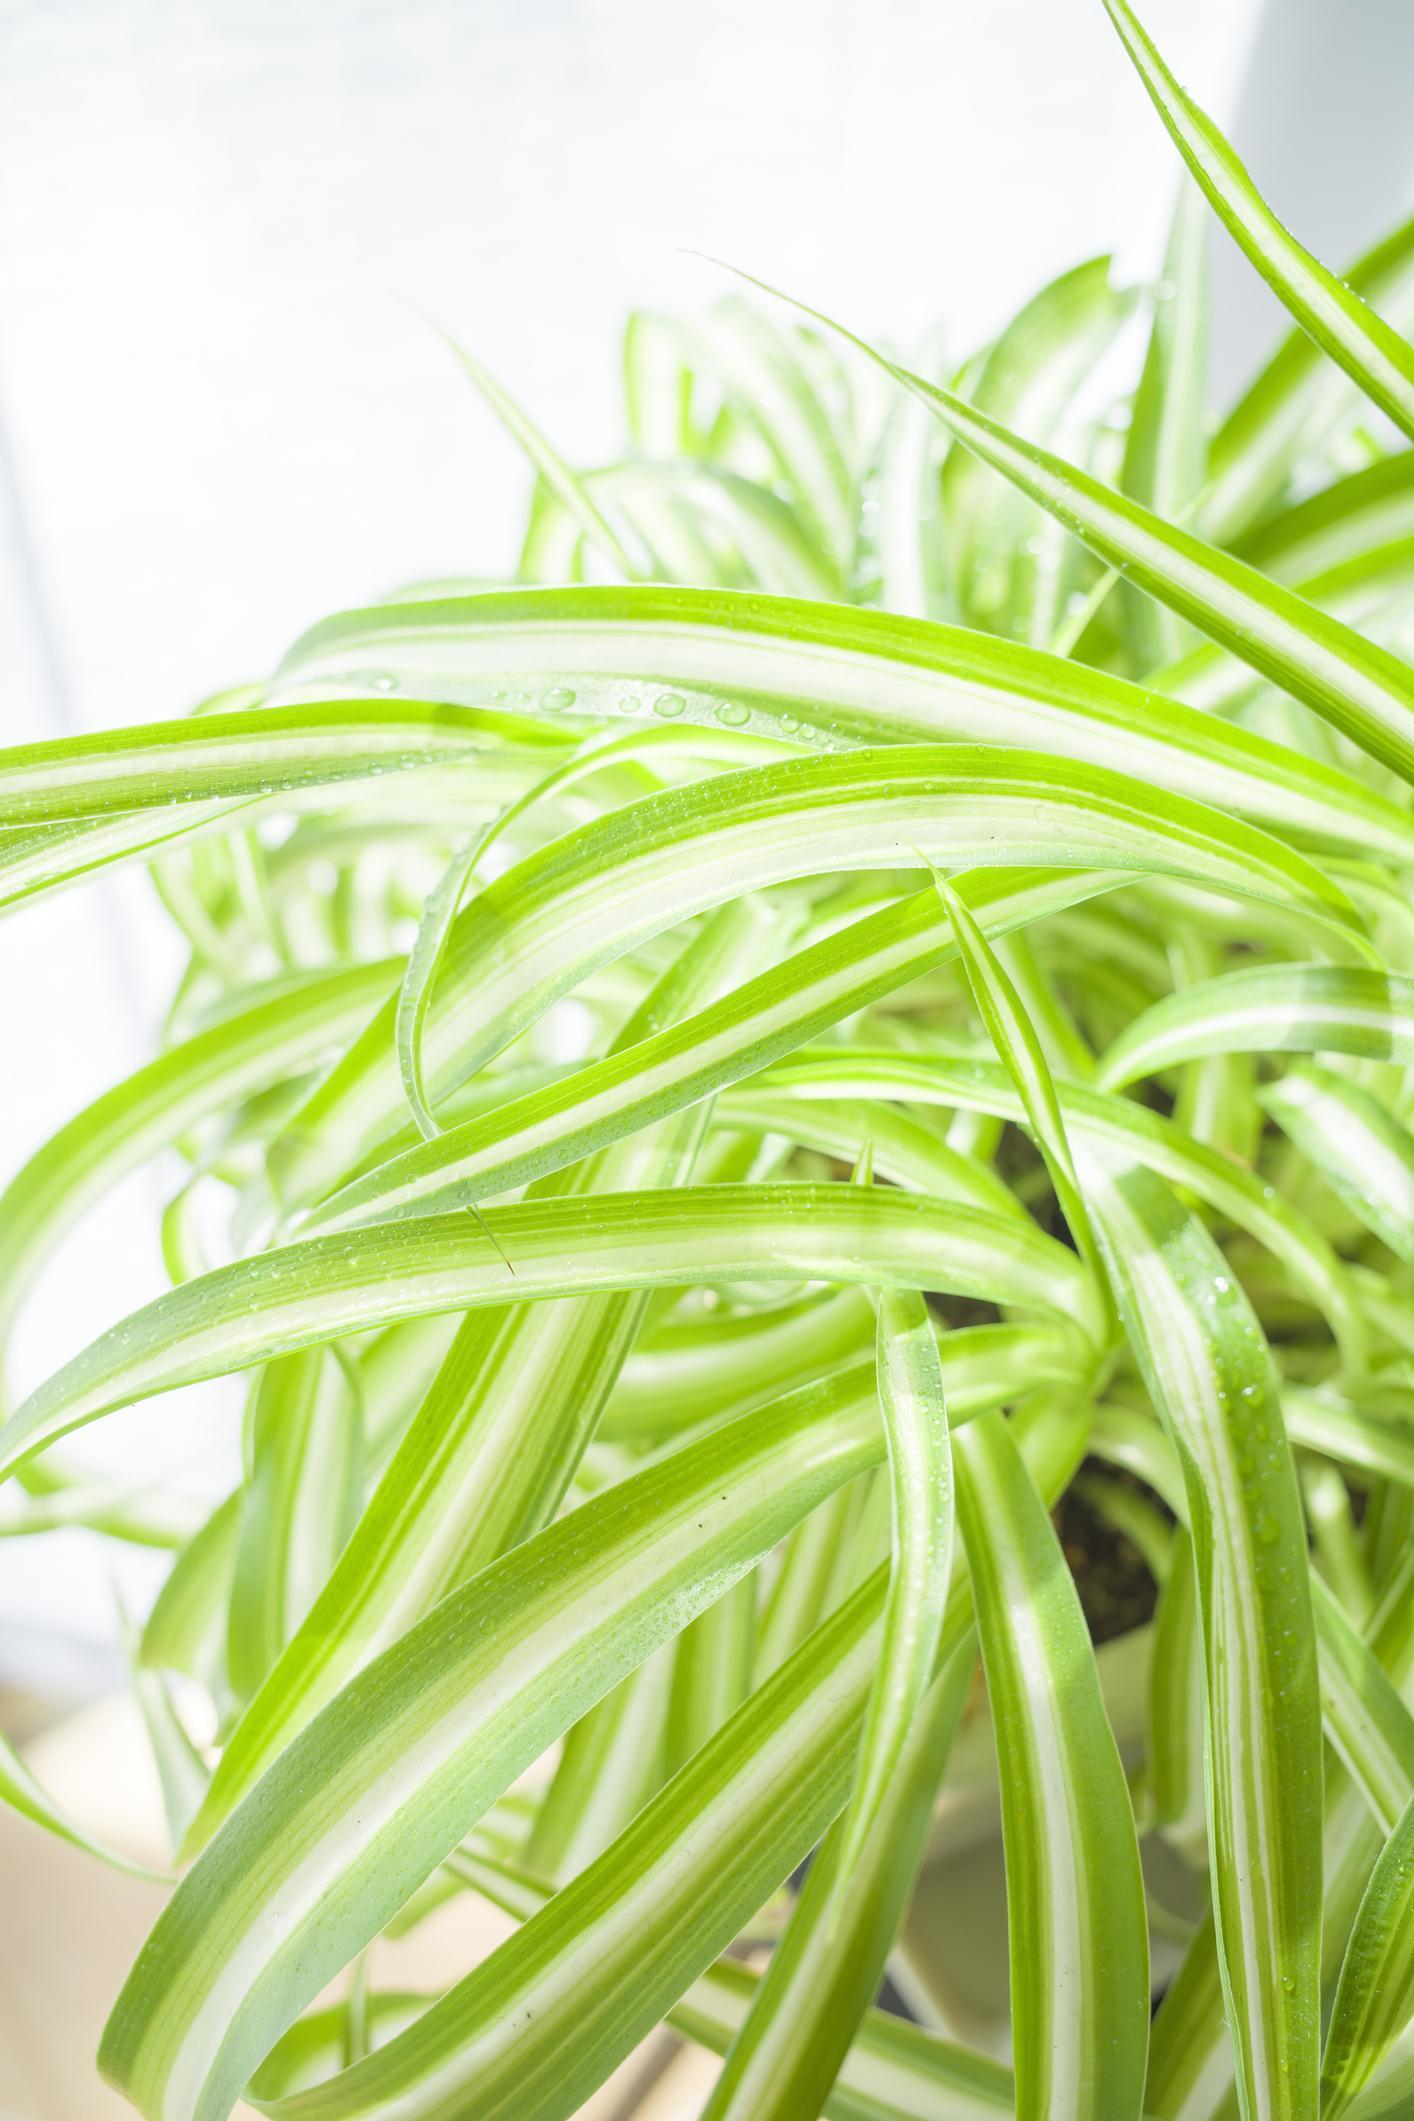 Graslelie (Chlorophytum)